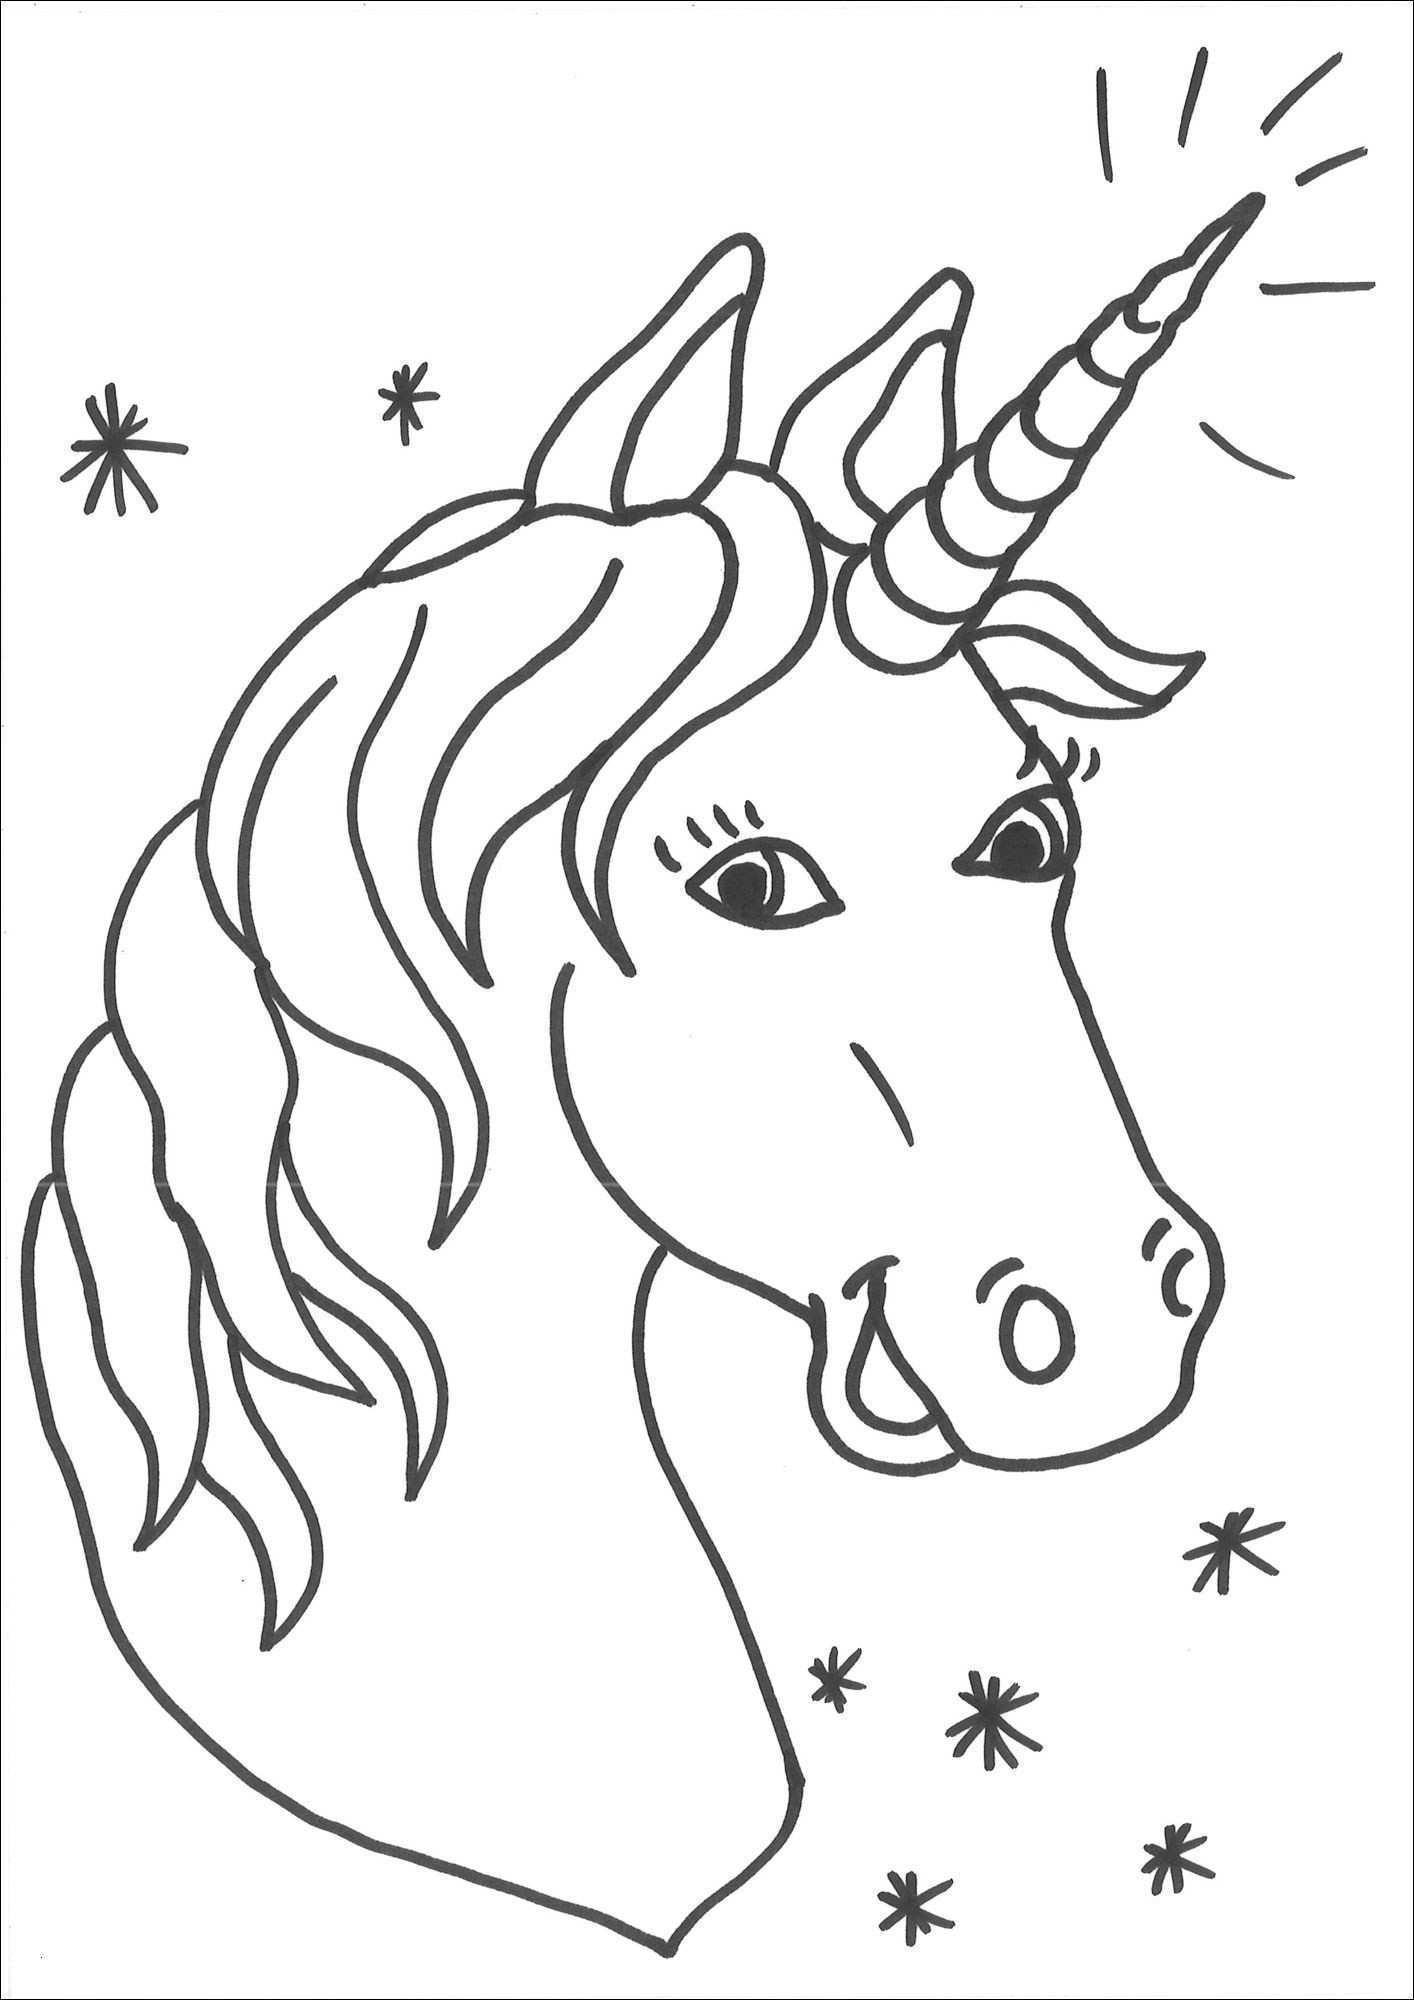 Pegasus Zum Ausmalen Frisch Pegasus Zum Ausmalen Galerie 35 Malvorlagen Pegasus Scoredatscore Stock